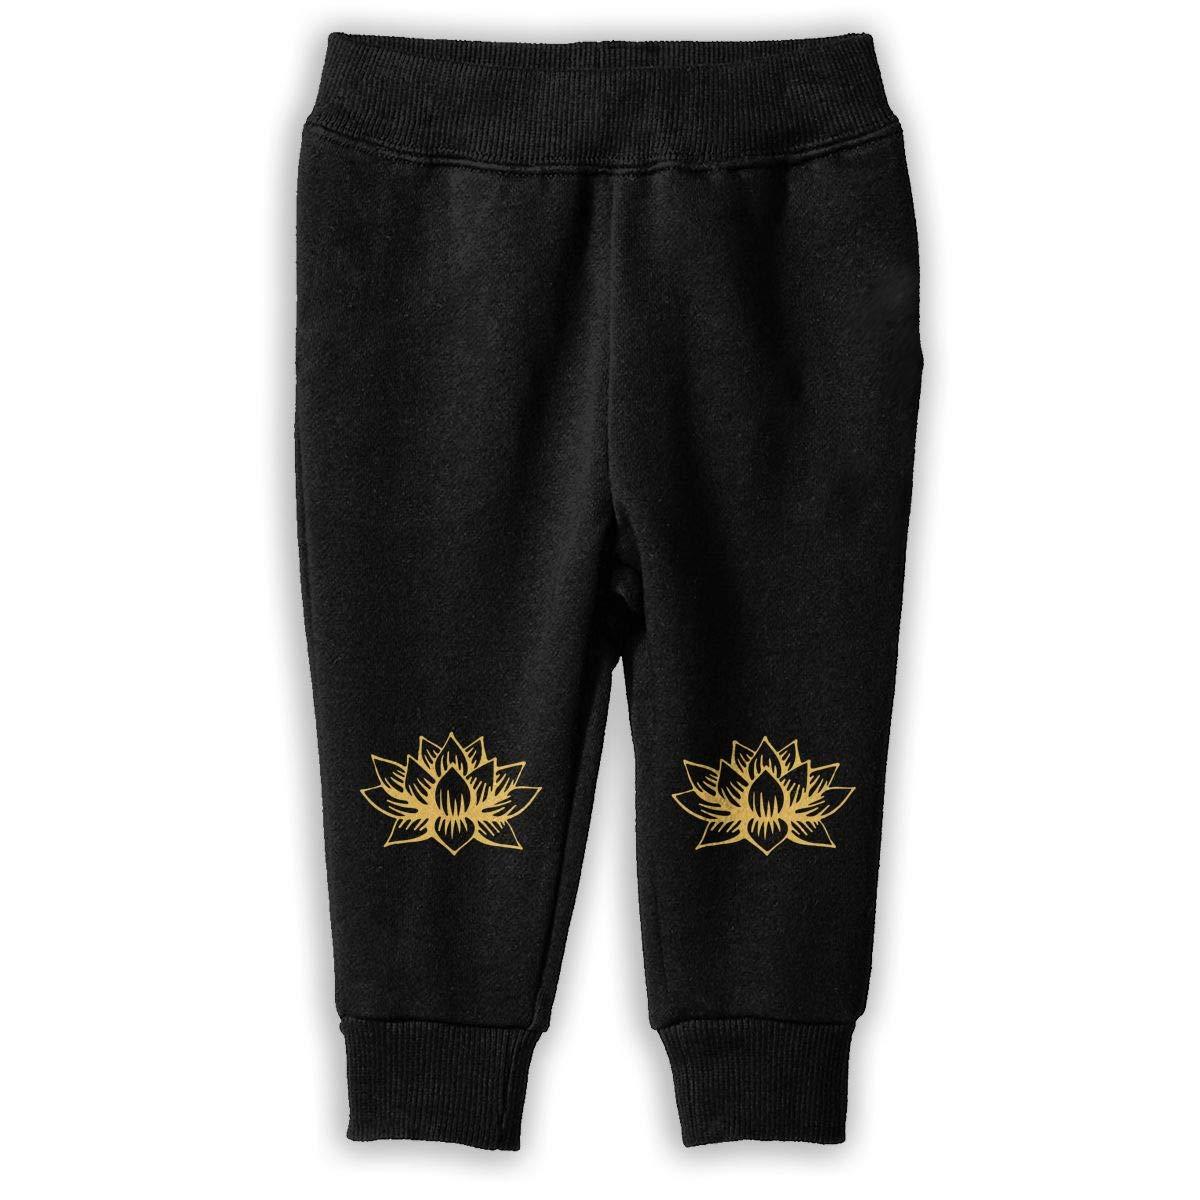 NJKM5MJ White Golden Lotus Mandala Sweatpants Toddler Jogger Pants